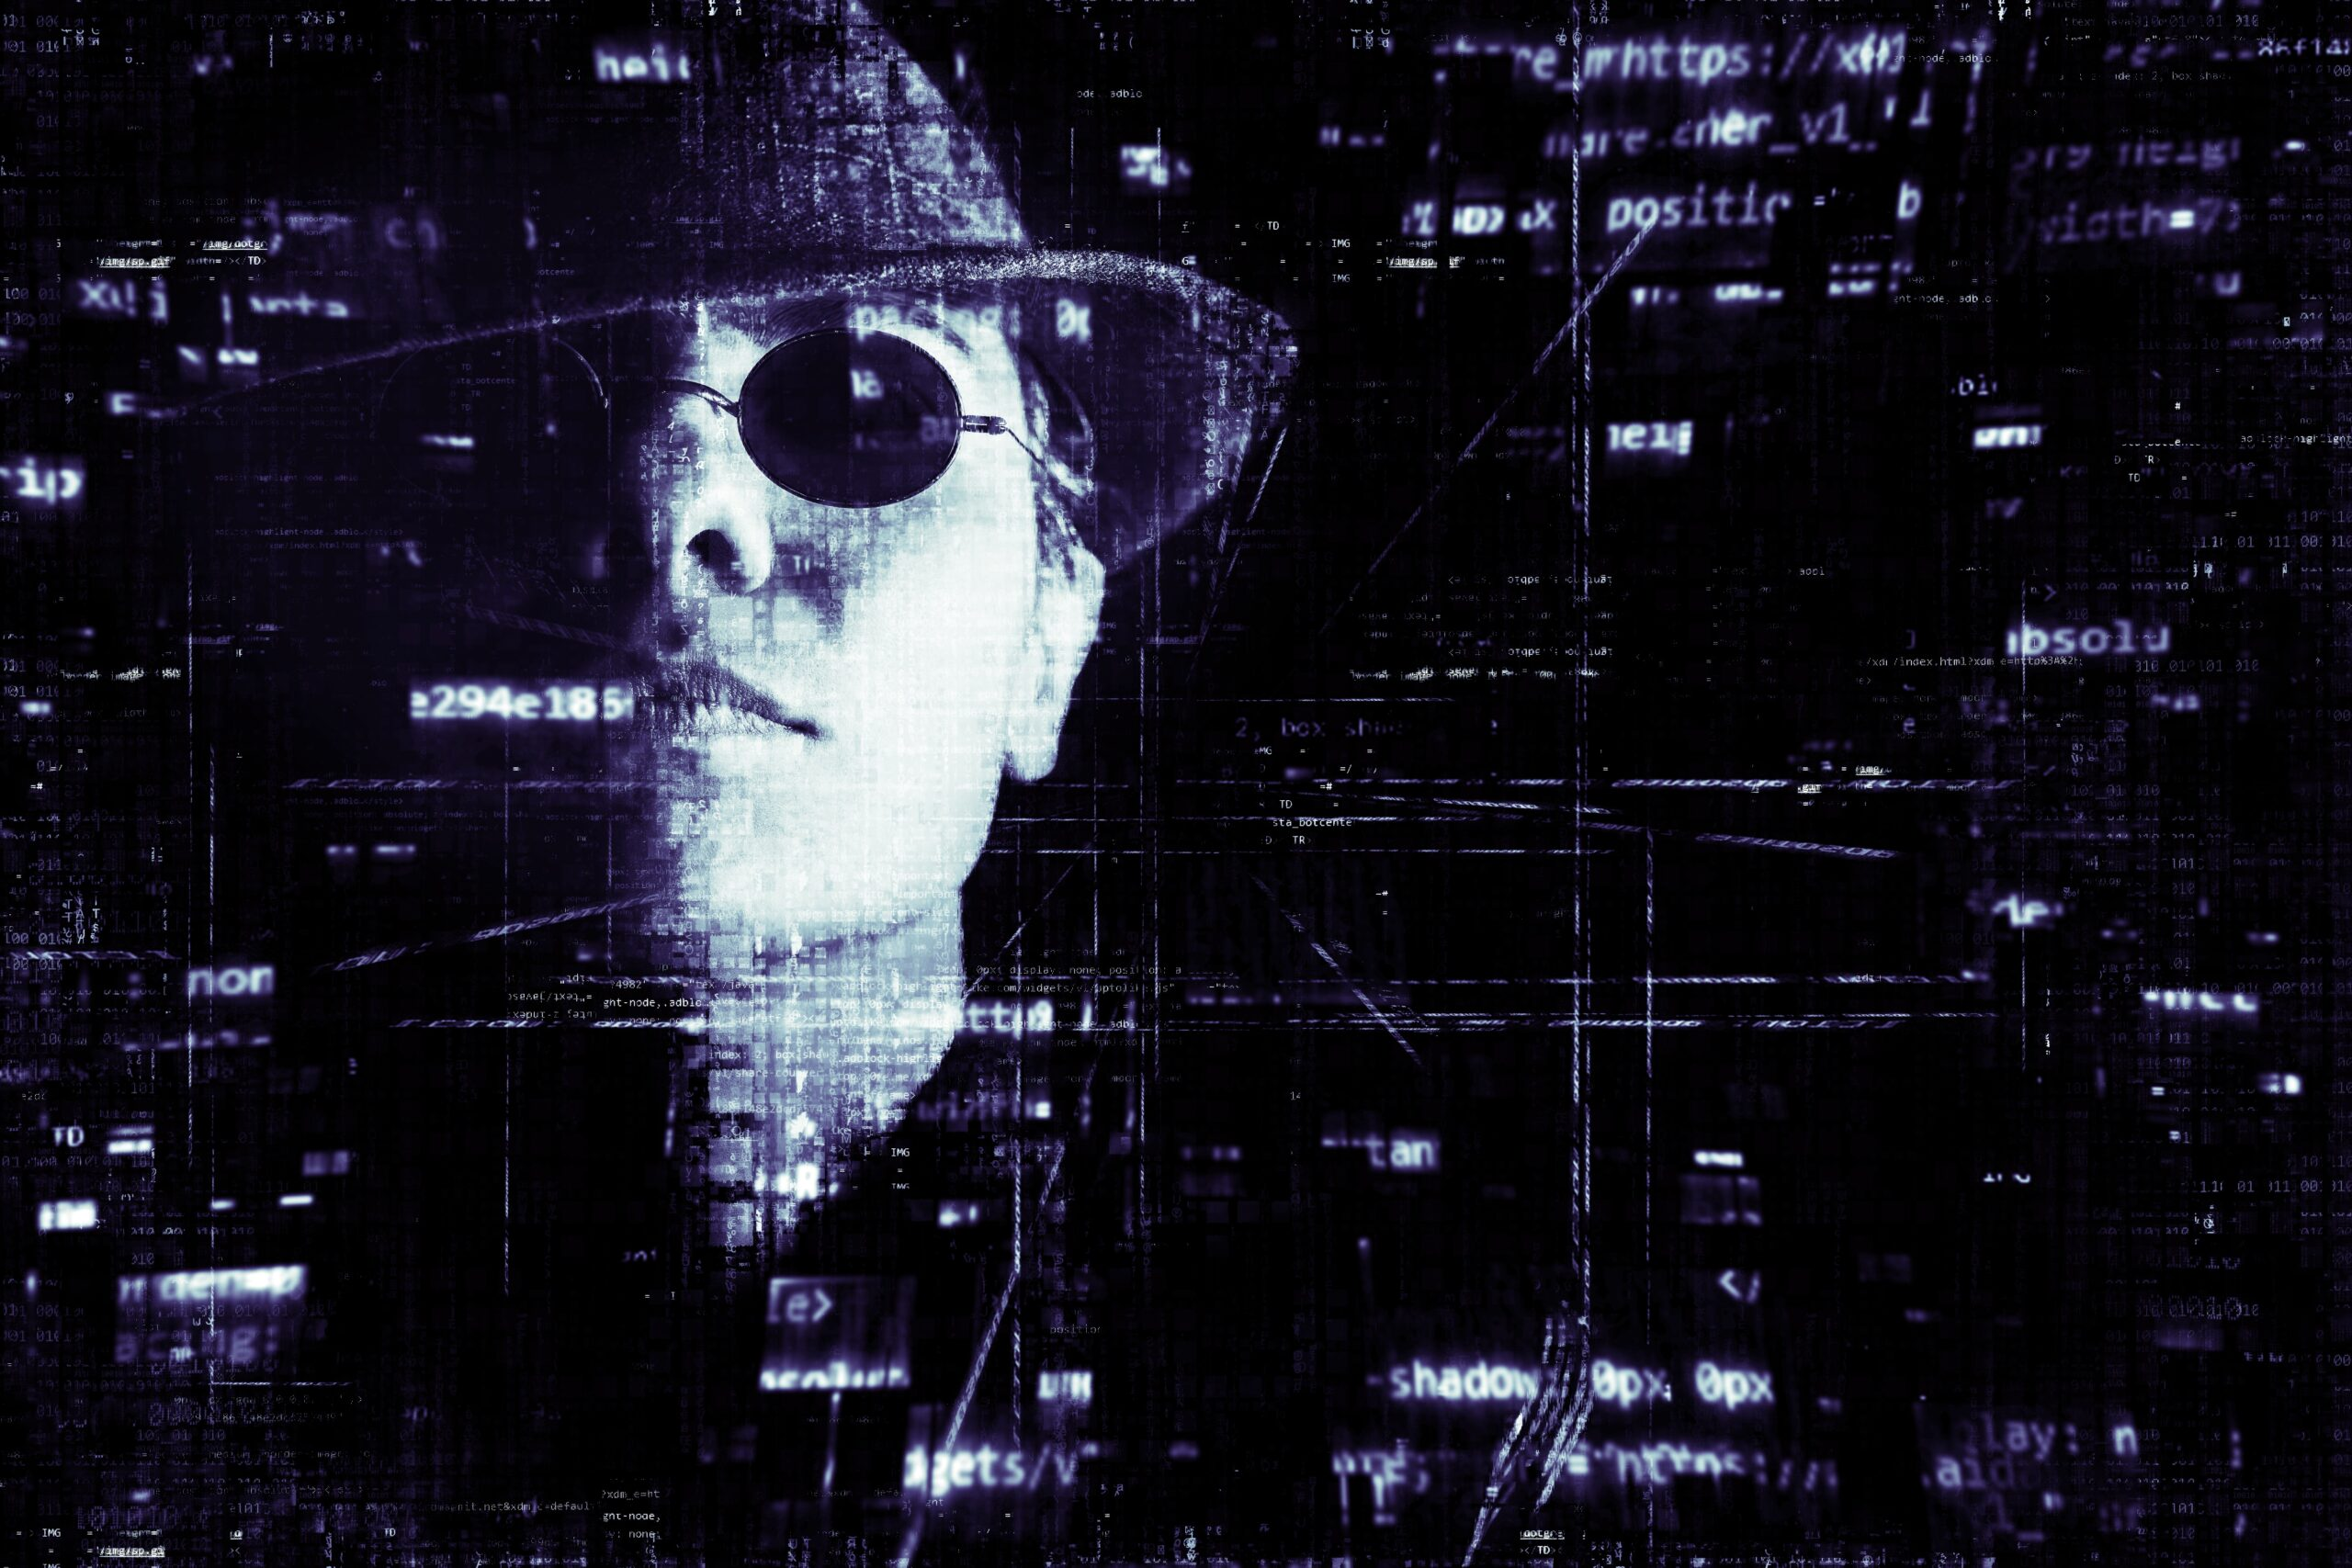 hacker, cybercrime, security